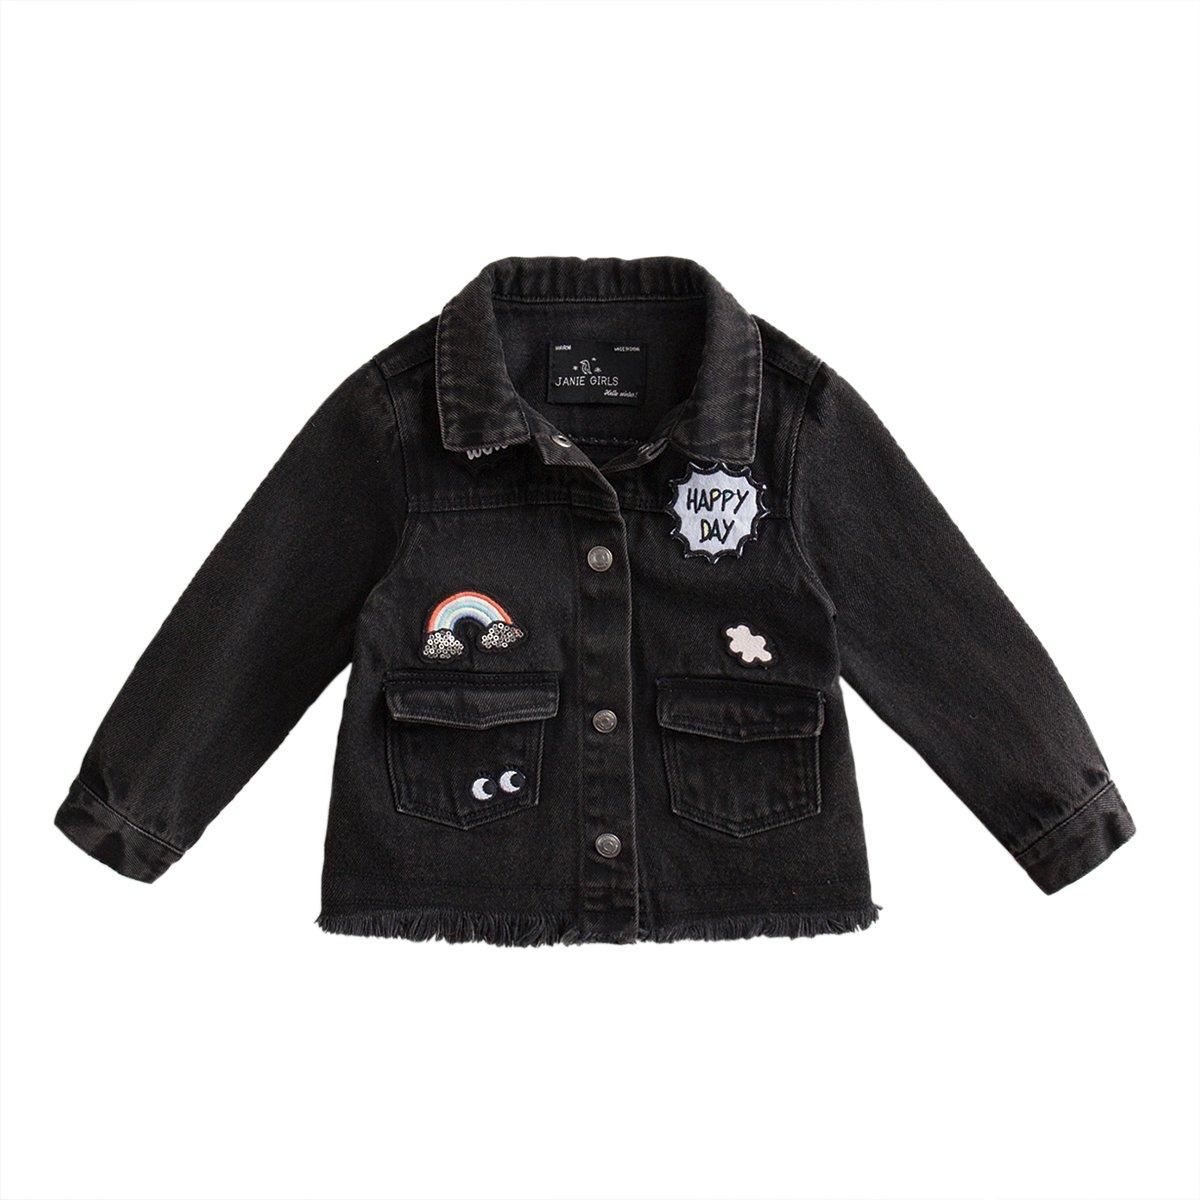 marc janie Little Boys Autumn Pre-Washed Denim Jacket Baby Boys Denim Coat TW15163